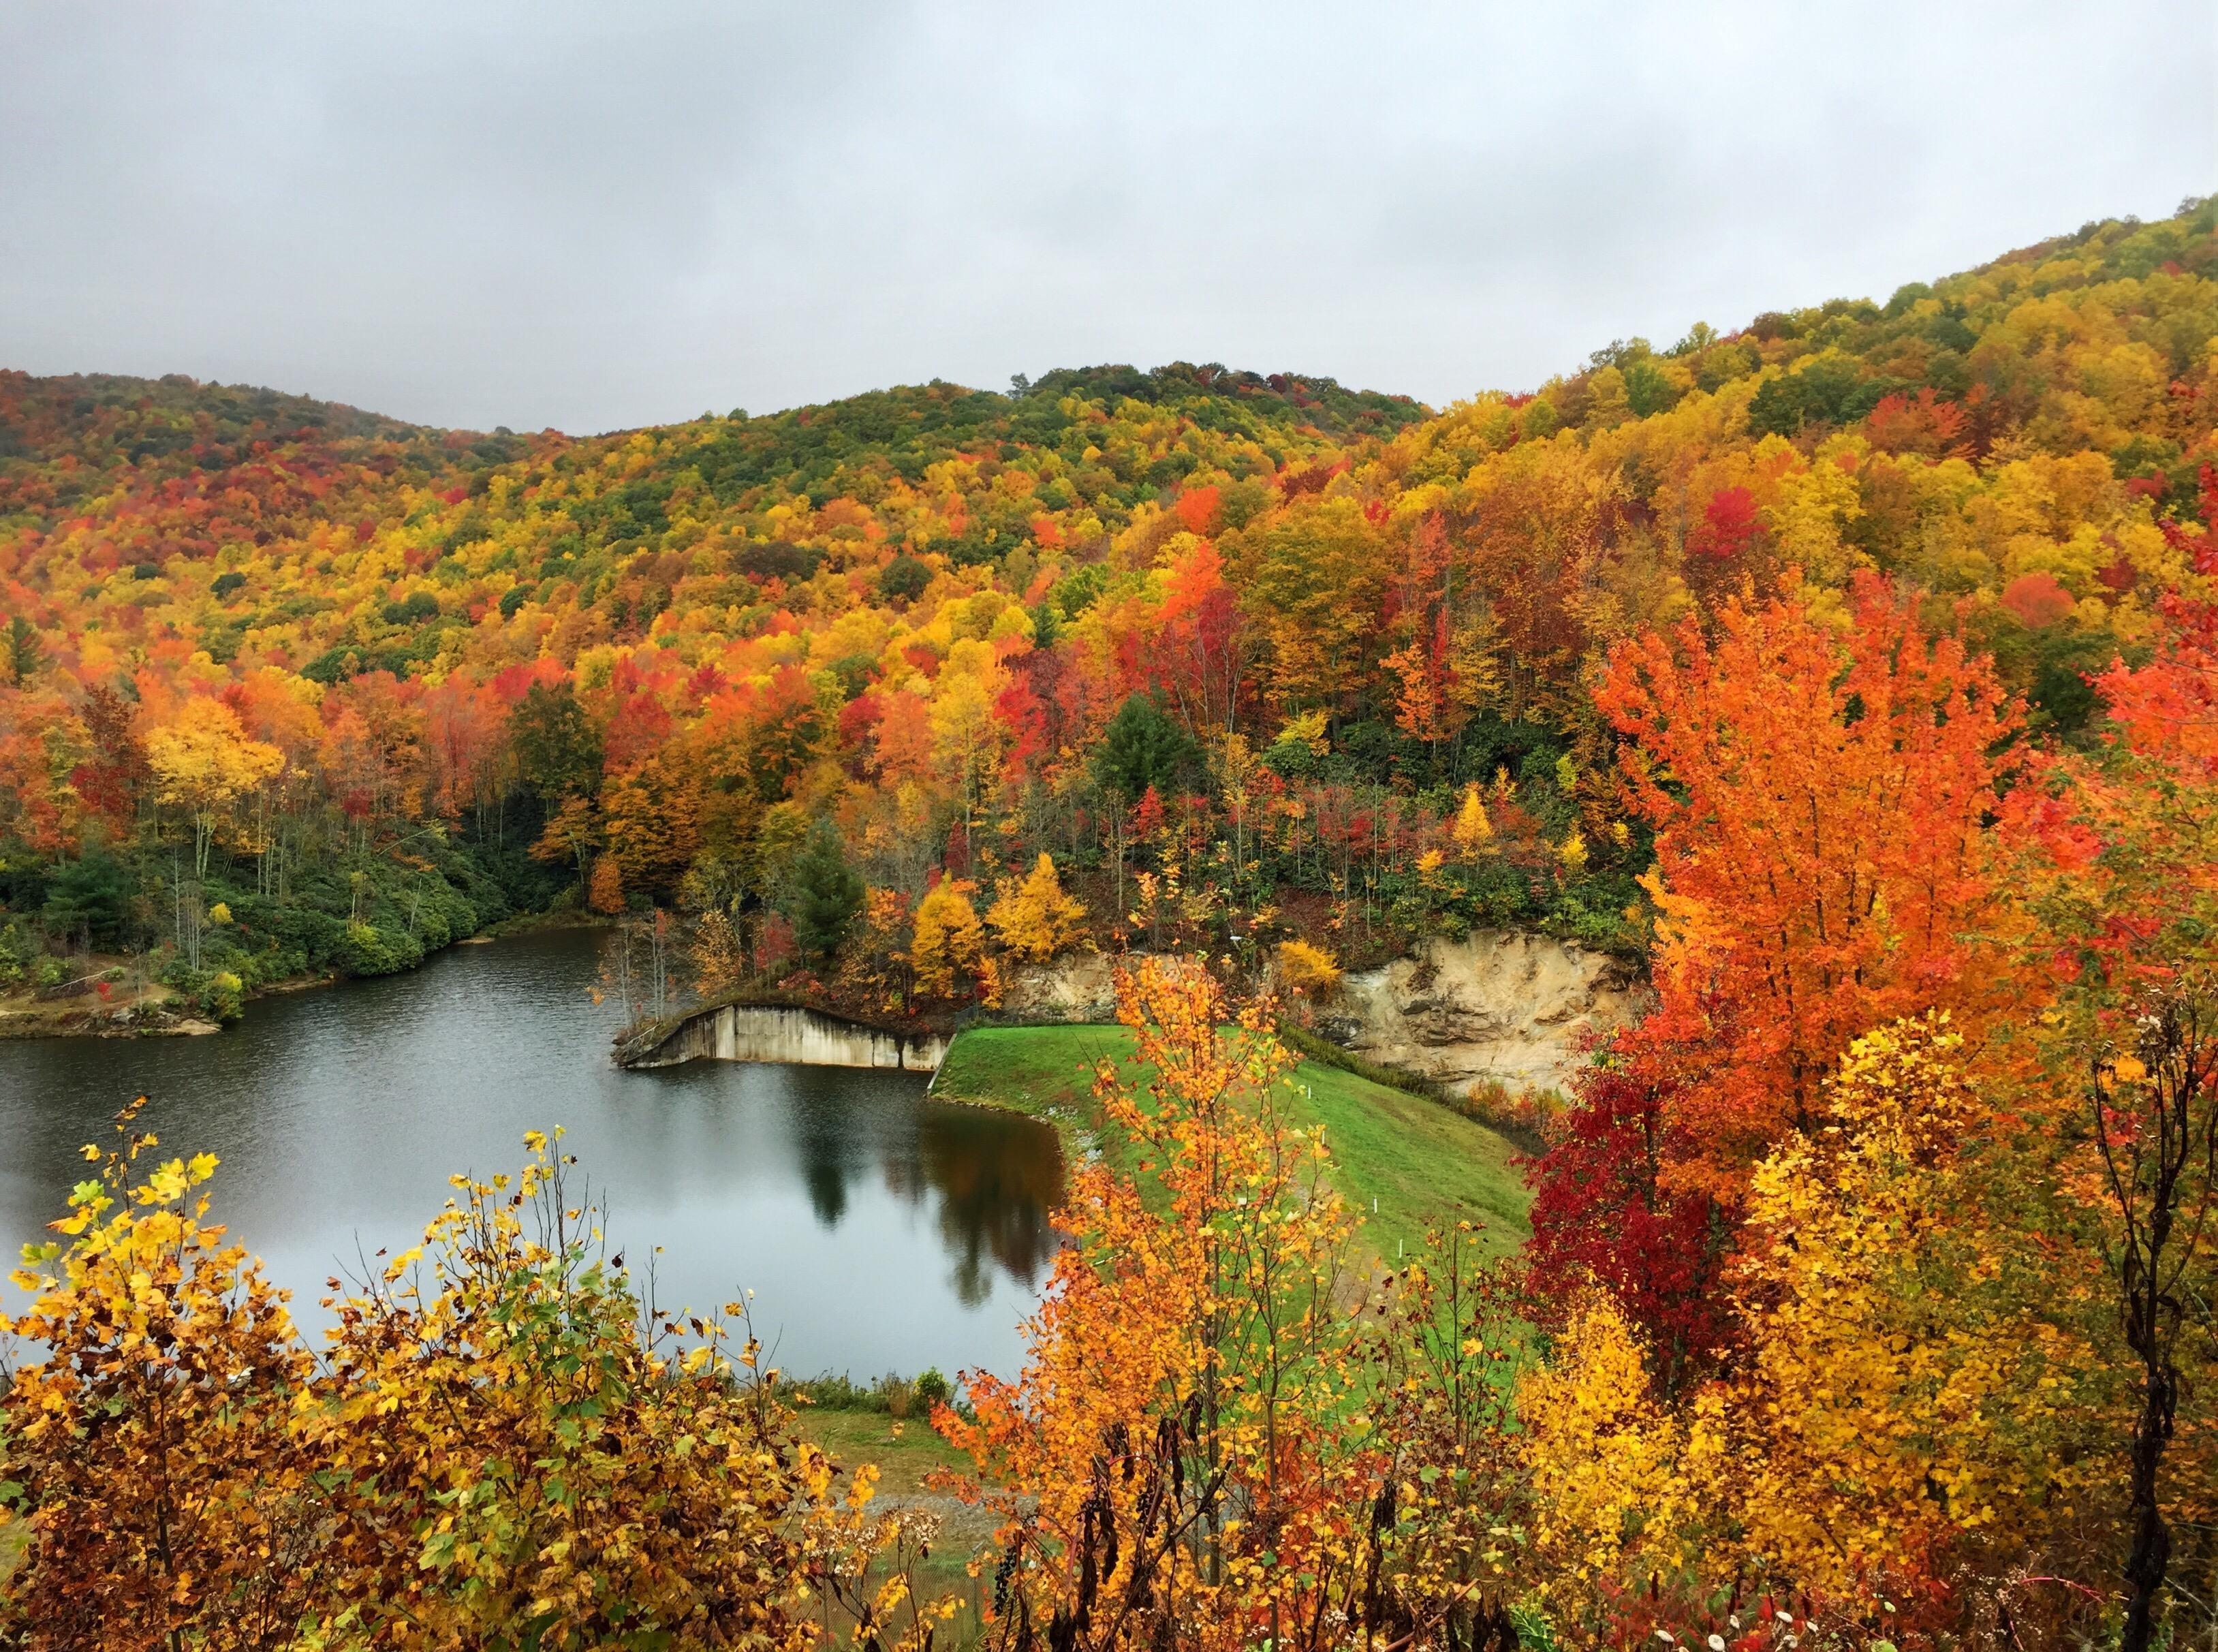 Laurel Creek, North Carolina, United States of America